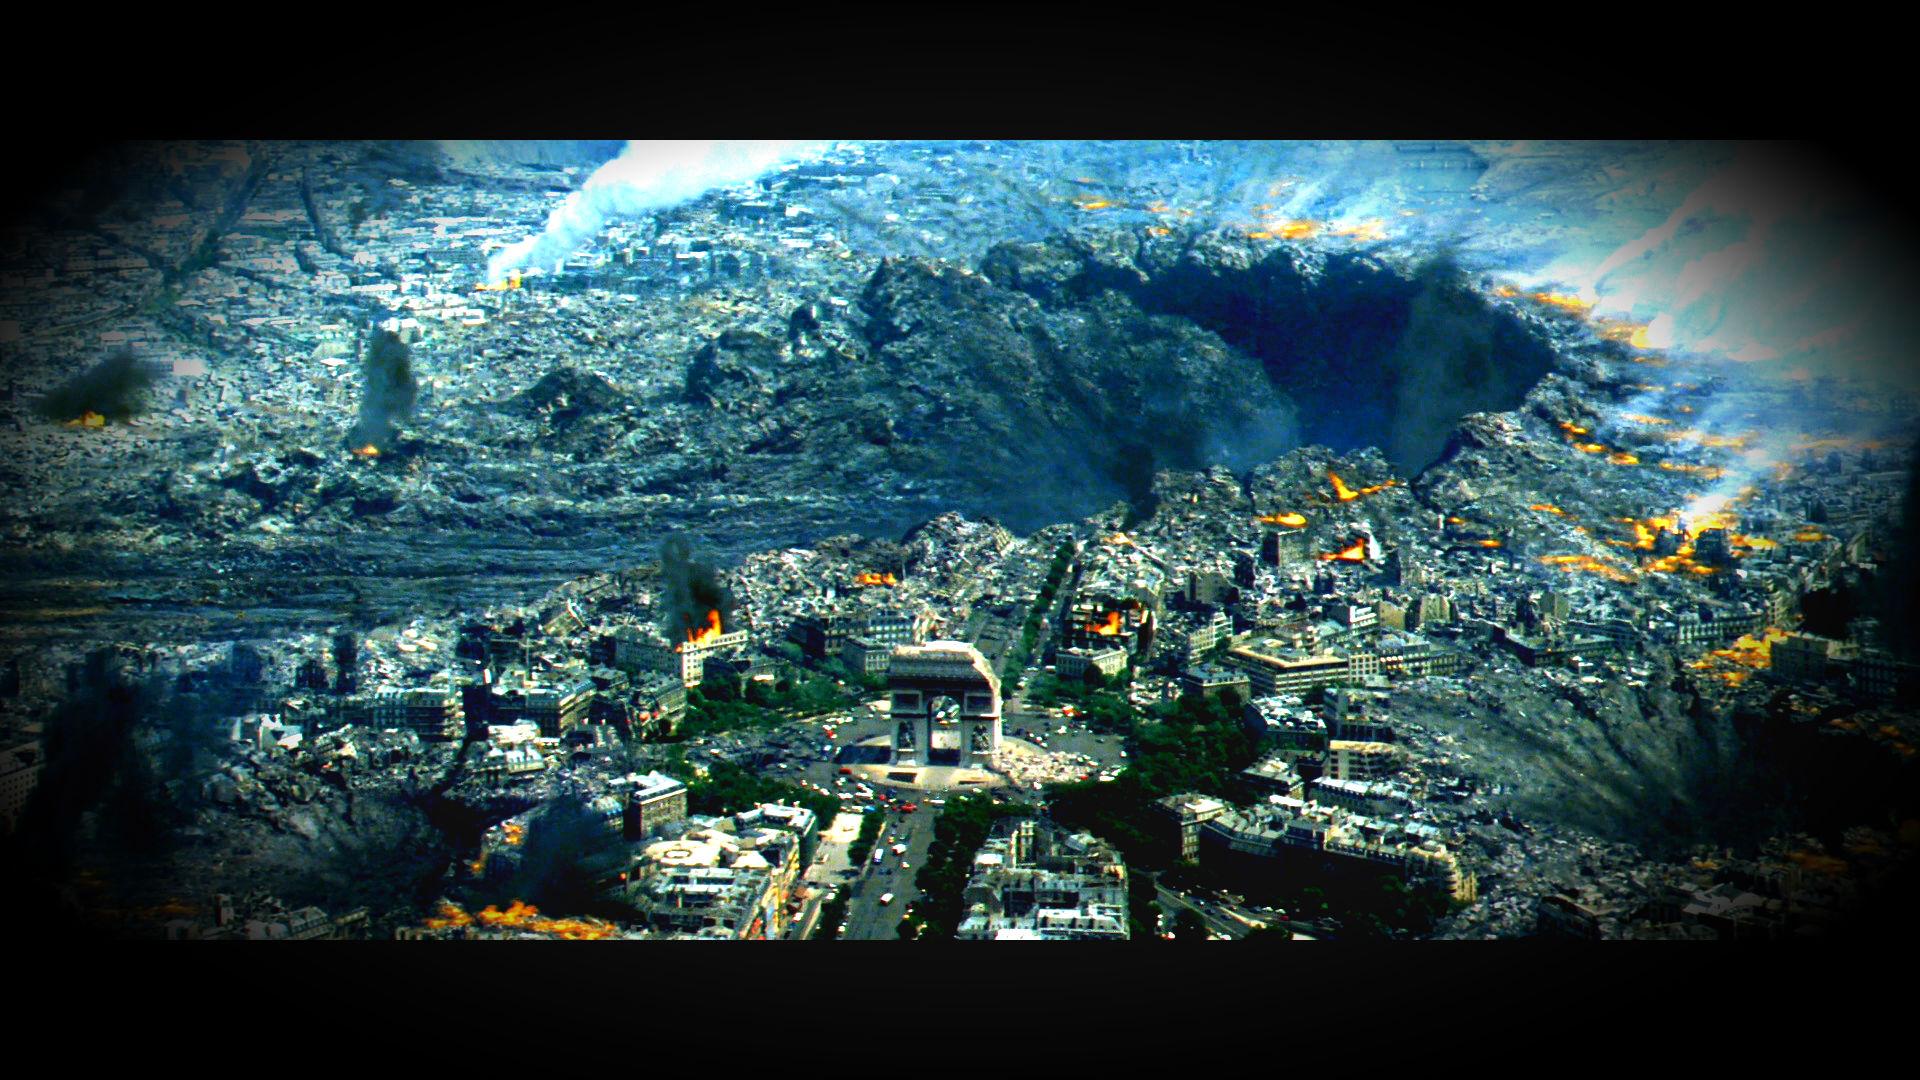 ARMAGEDDON action adventure sci-fi apocalyptic city d ...